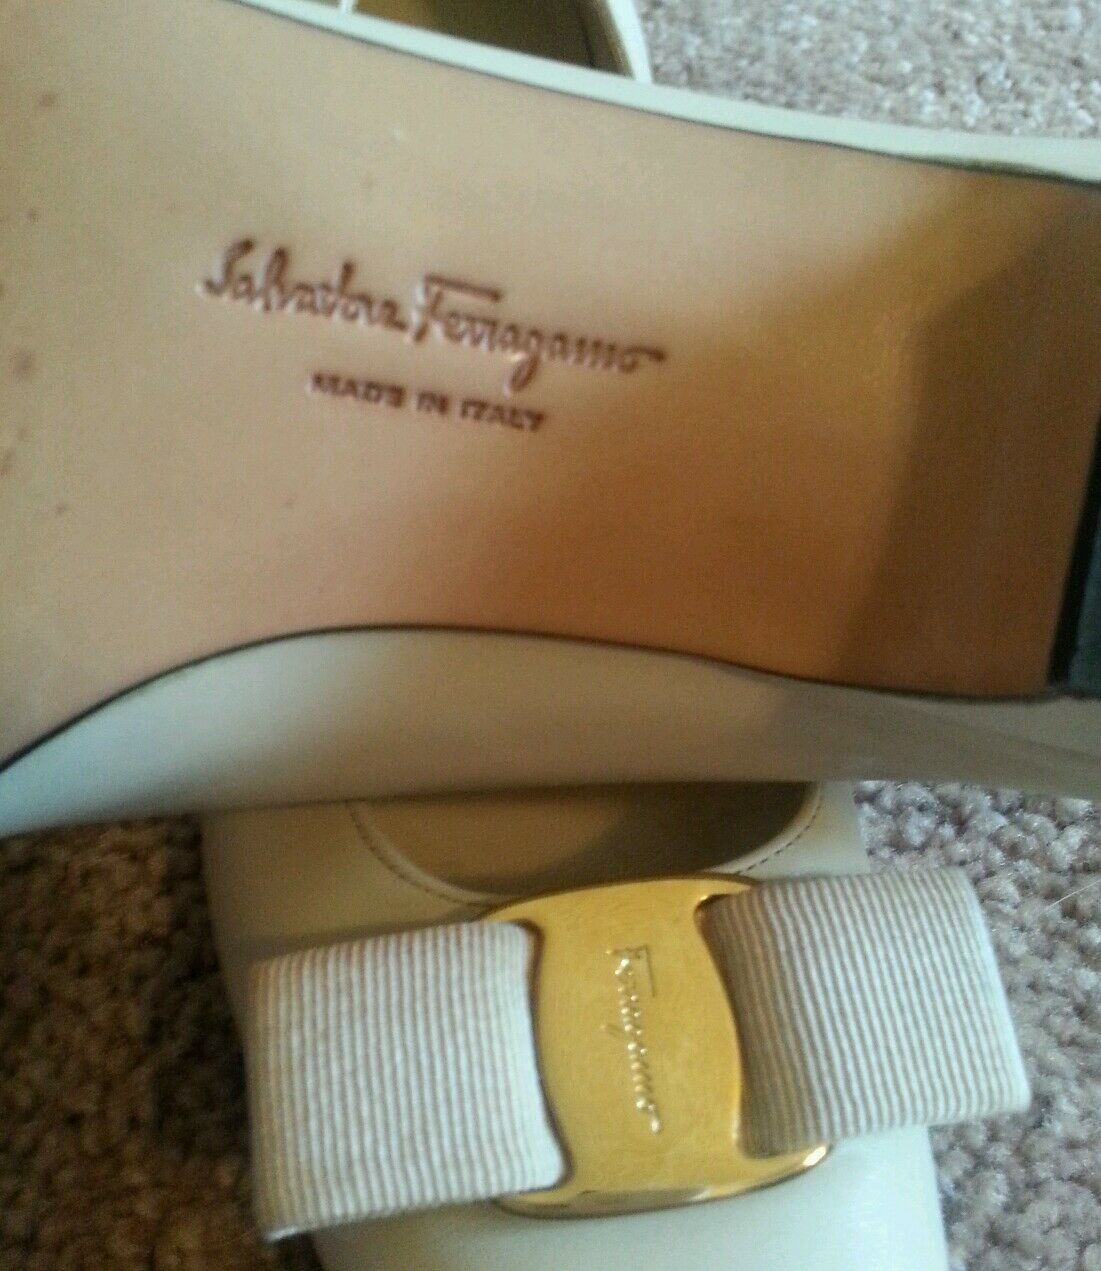 SALVATORE FERRAGAMO Ivory Cream Leather Low Heel VARA Bow Pumps Sz 7AAA